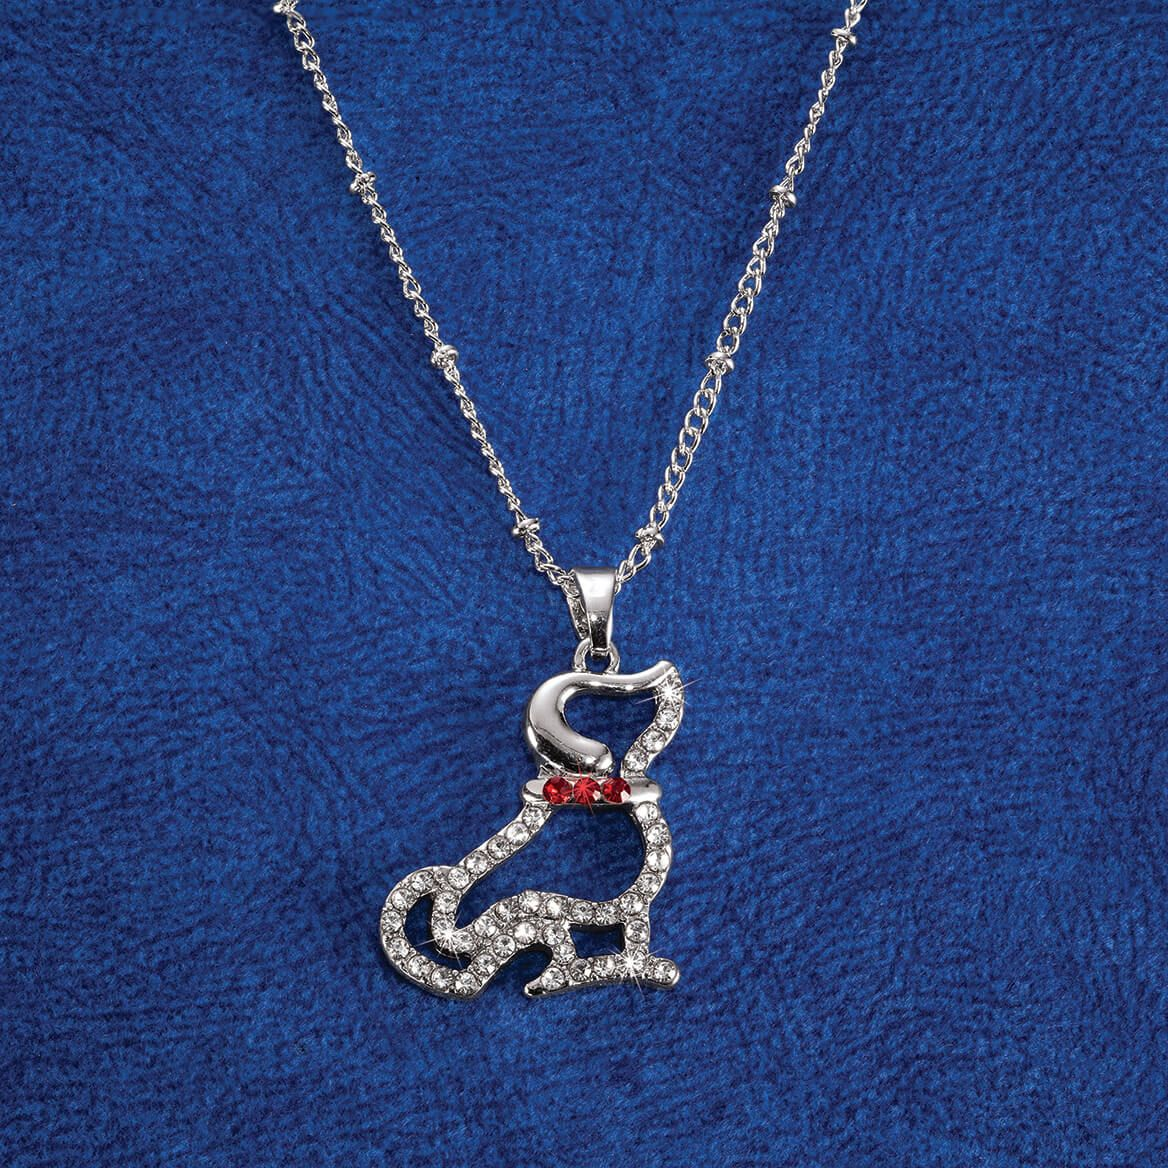 Crystal Dog Pendant-371965